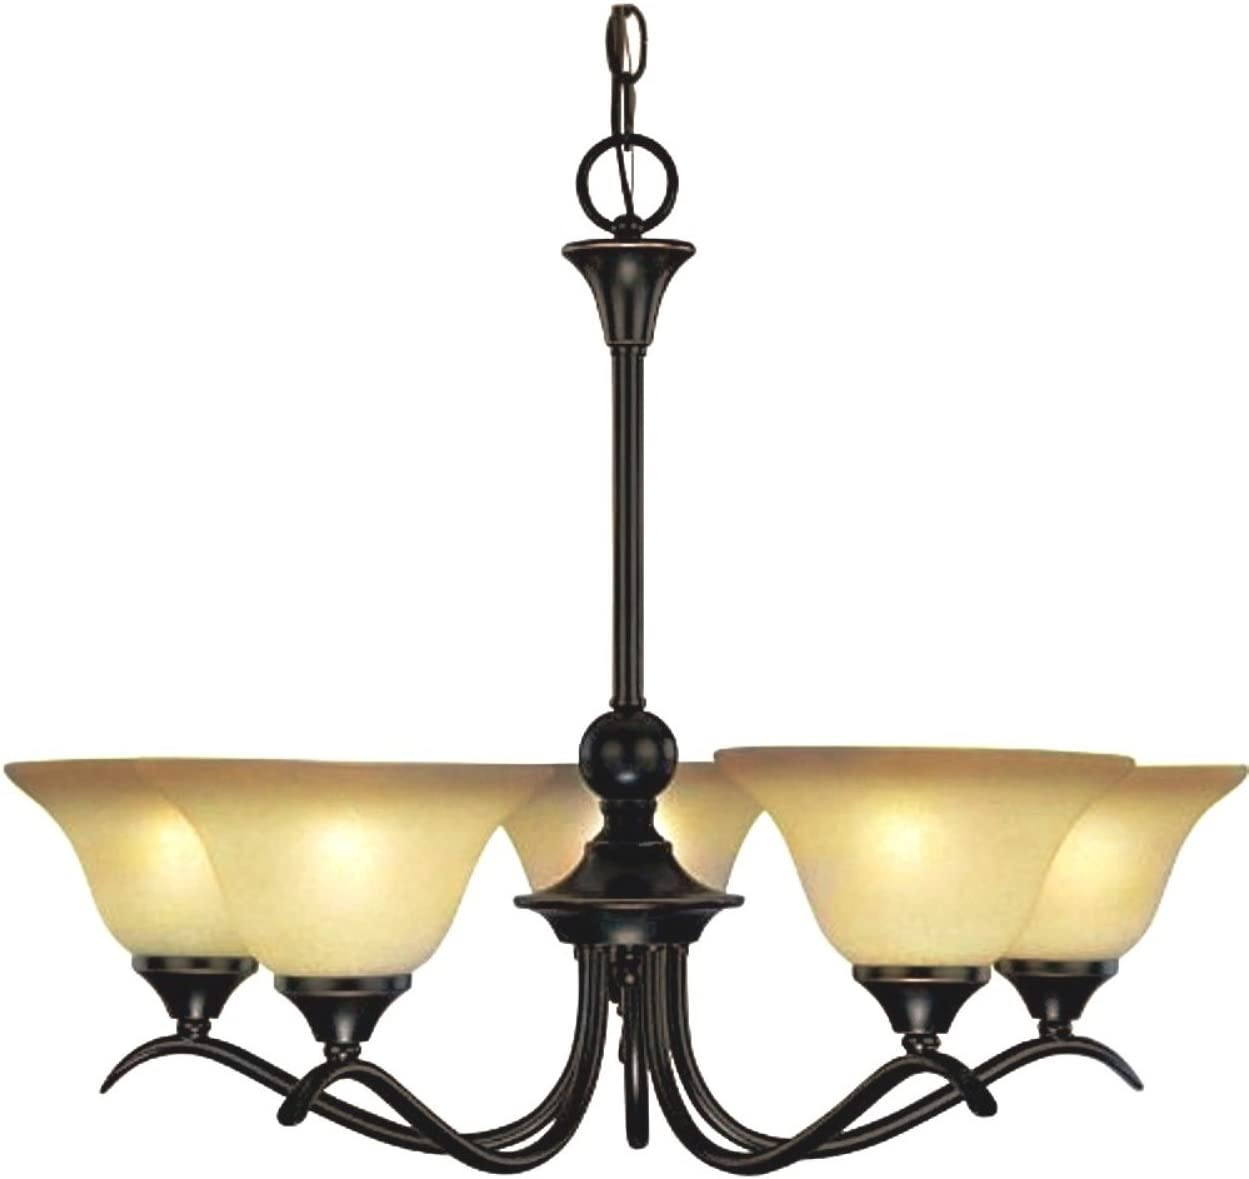 Hardware House 127547 Chandelier, 5 Light Dover Series Classic Bronze